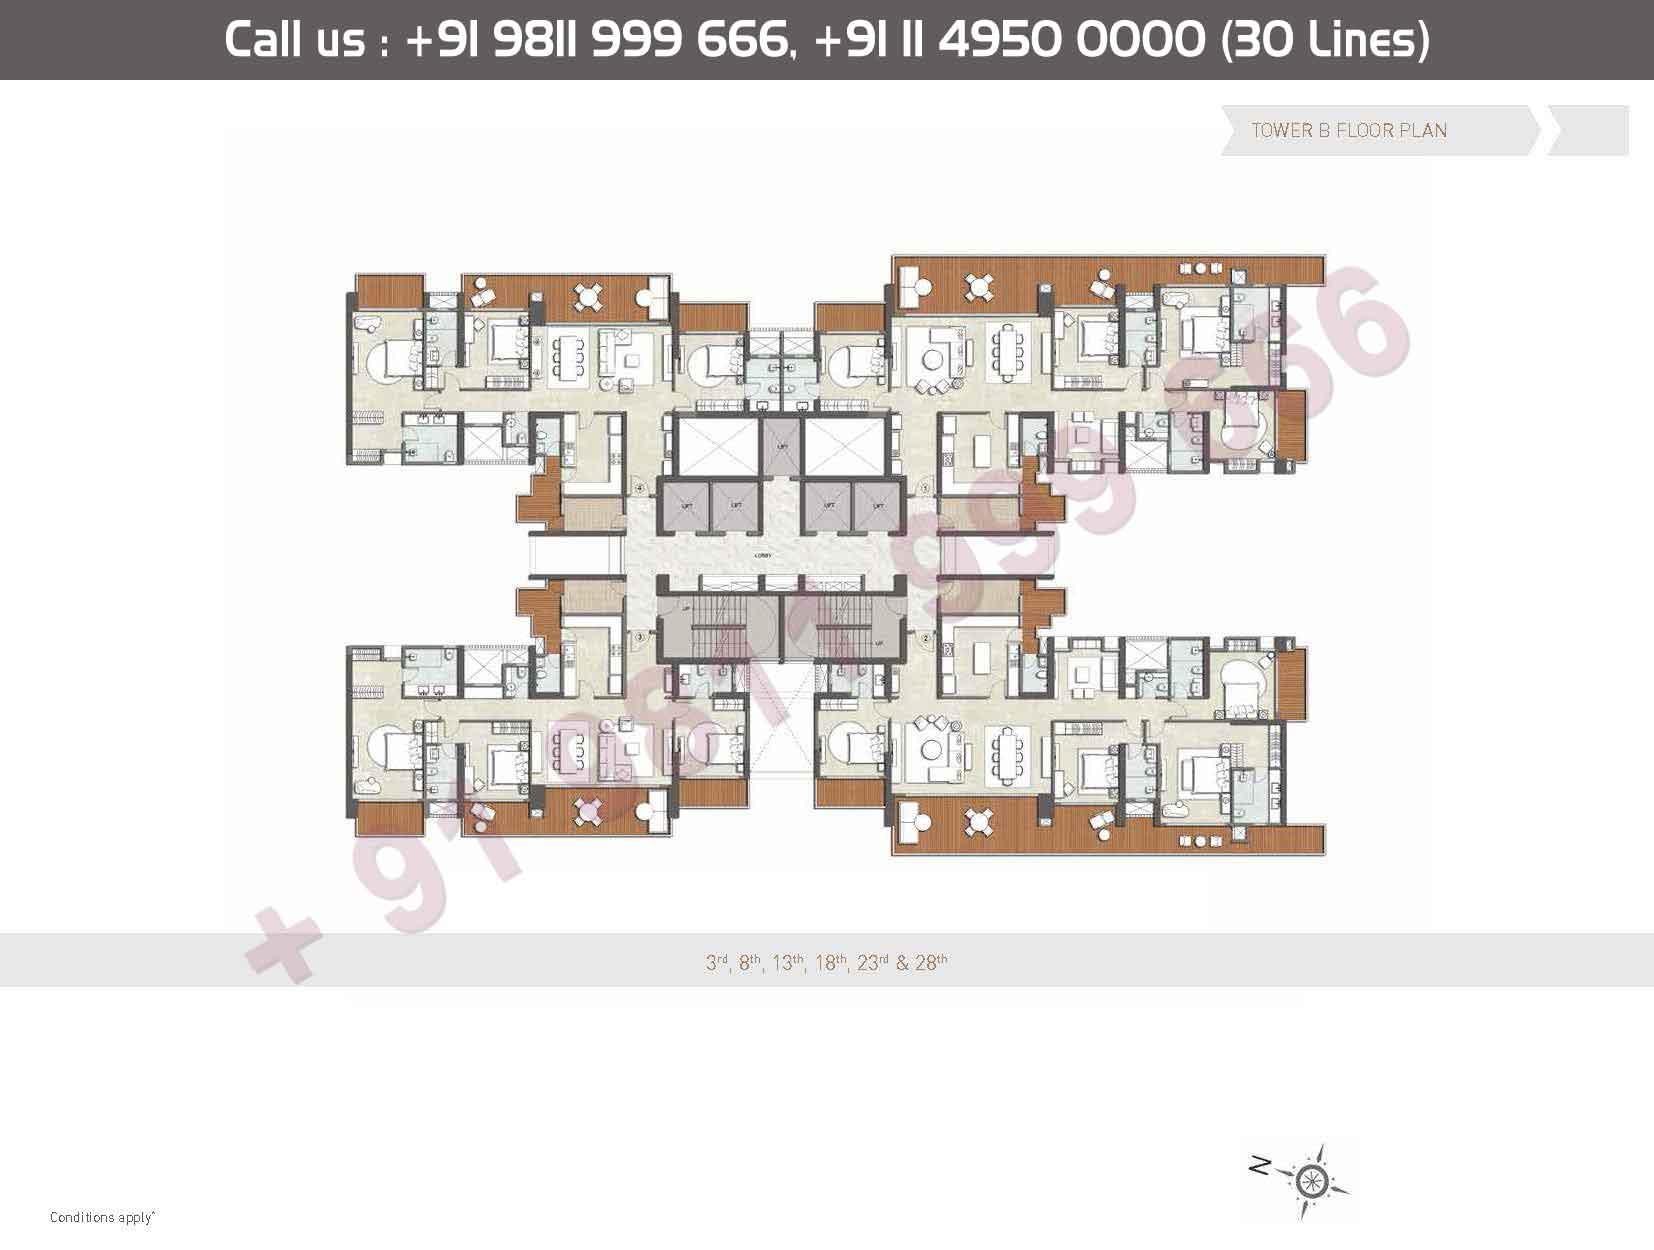 Floor: - 3rd,8th,13th,18th,23rd,28th